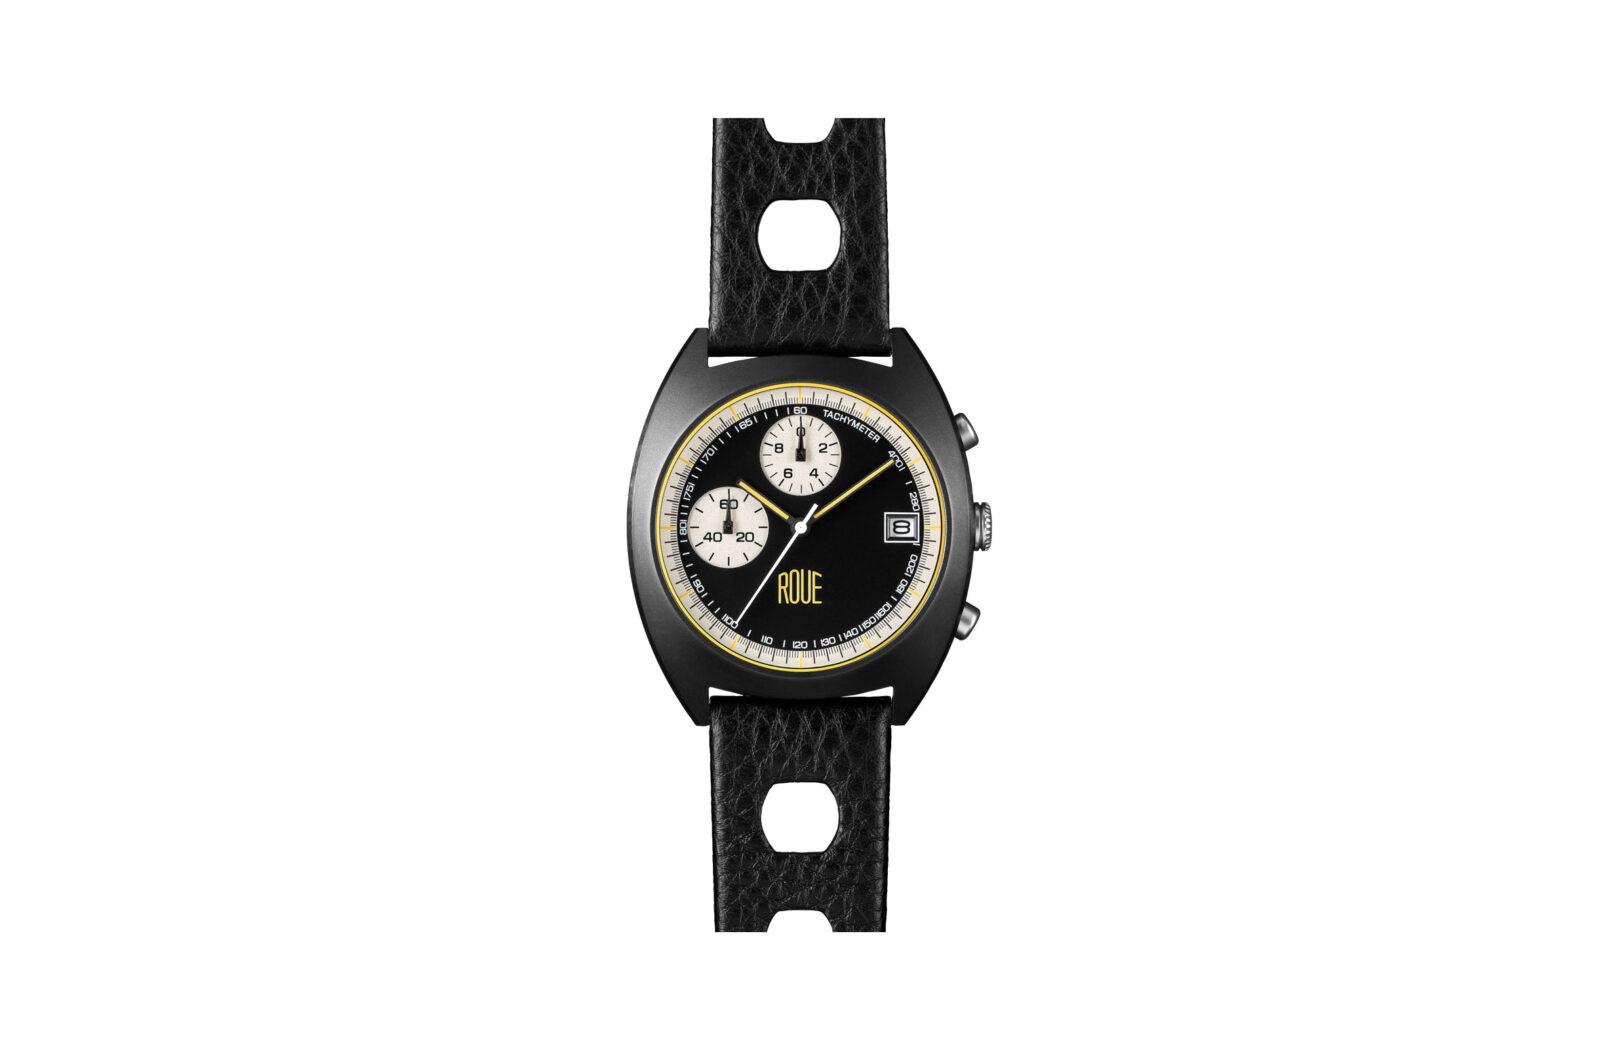 Roue CHR Watch 1 1600x1059 - Roue CHR Chronograph